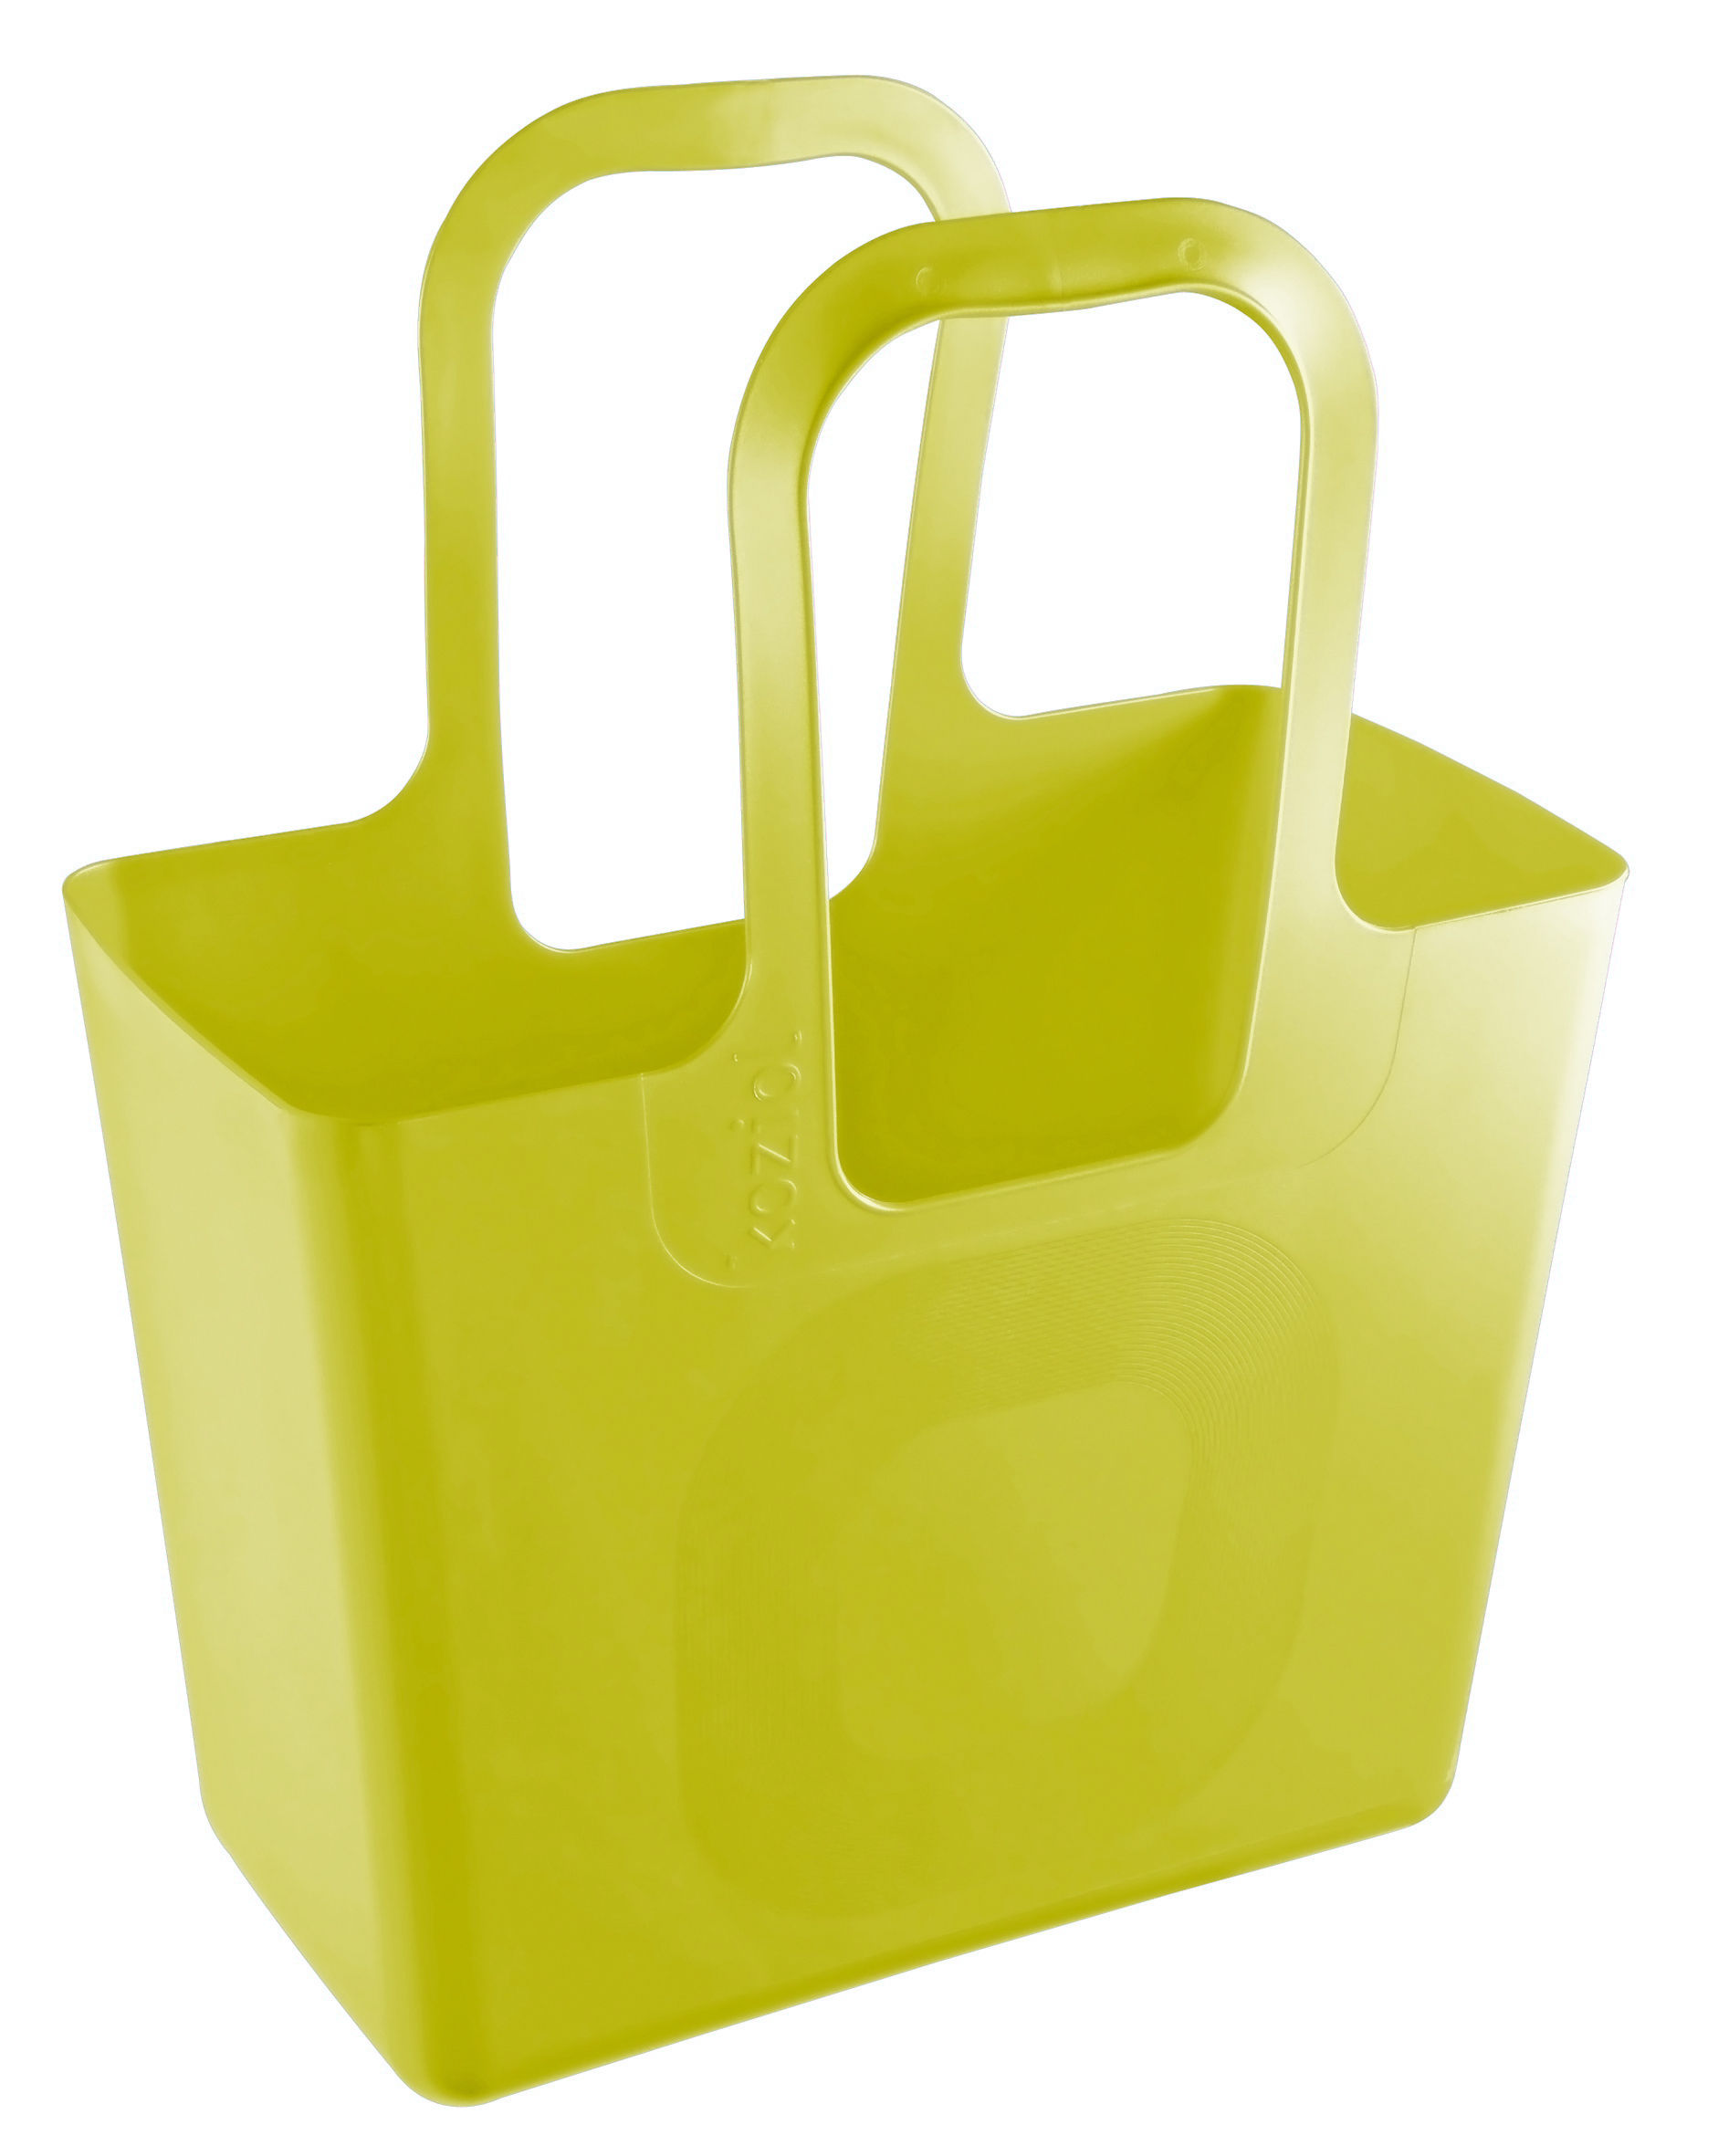 Dekoration - Badezimmer - Tasche XL Korb - Koziol - Senf - Plastikmaterial